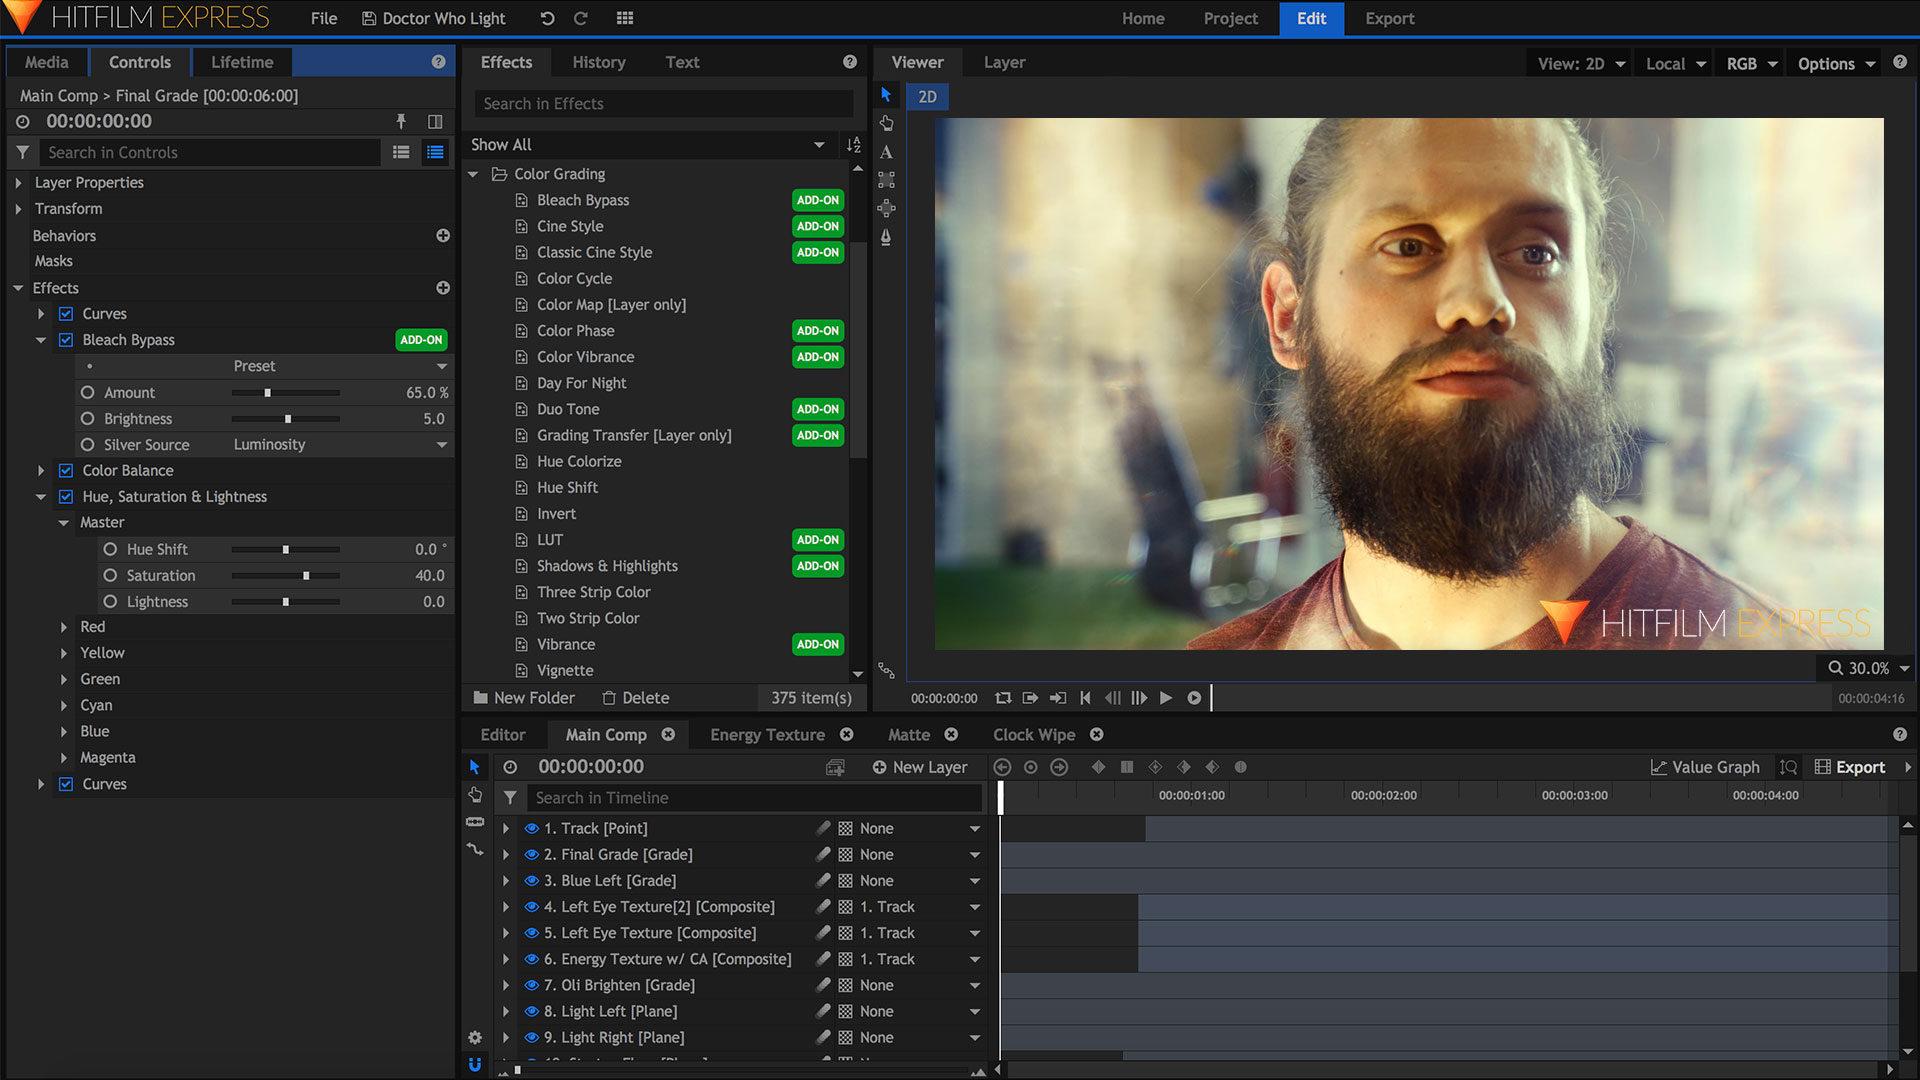 Using HitFilm Express' VFX to come up with short film ideas